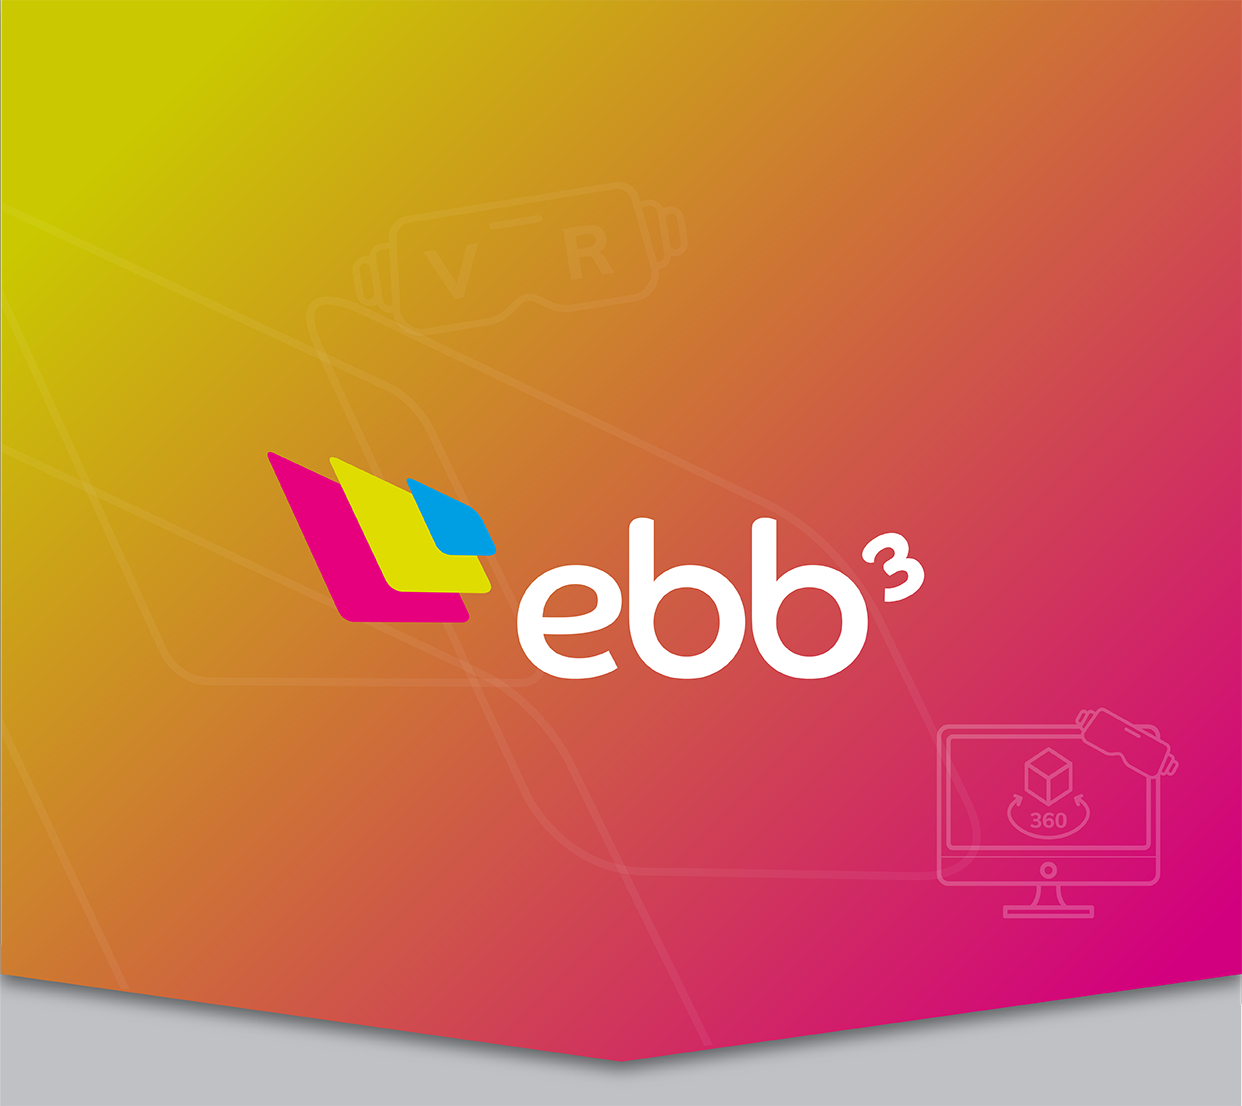 homepage ebb3 slider 06